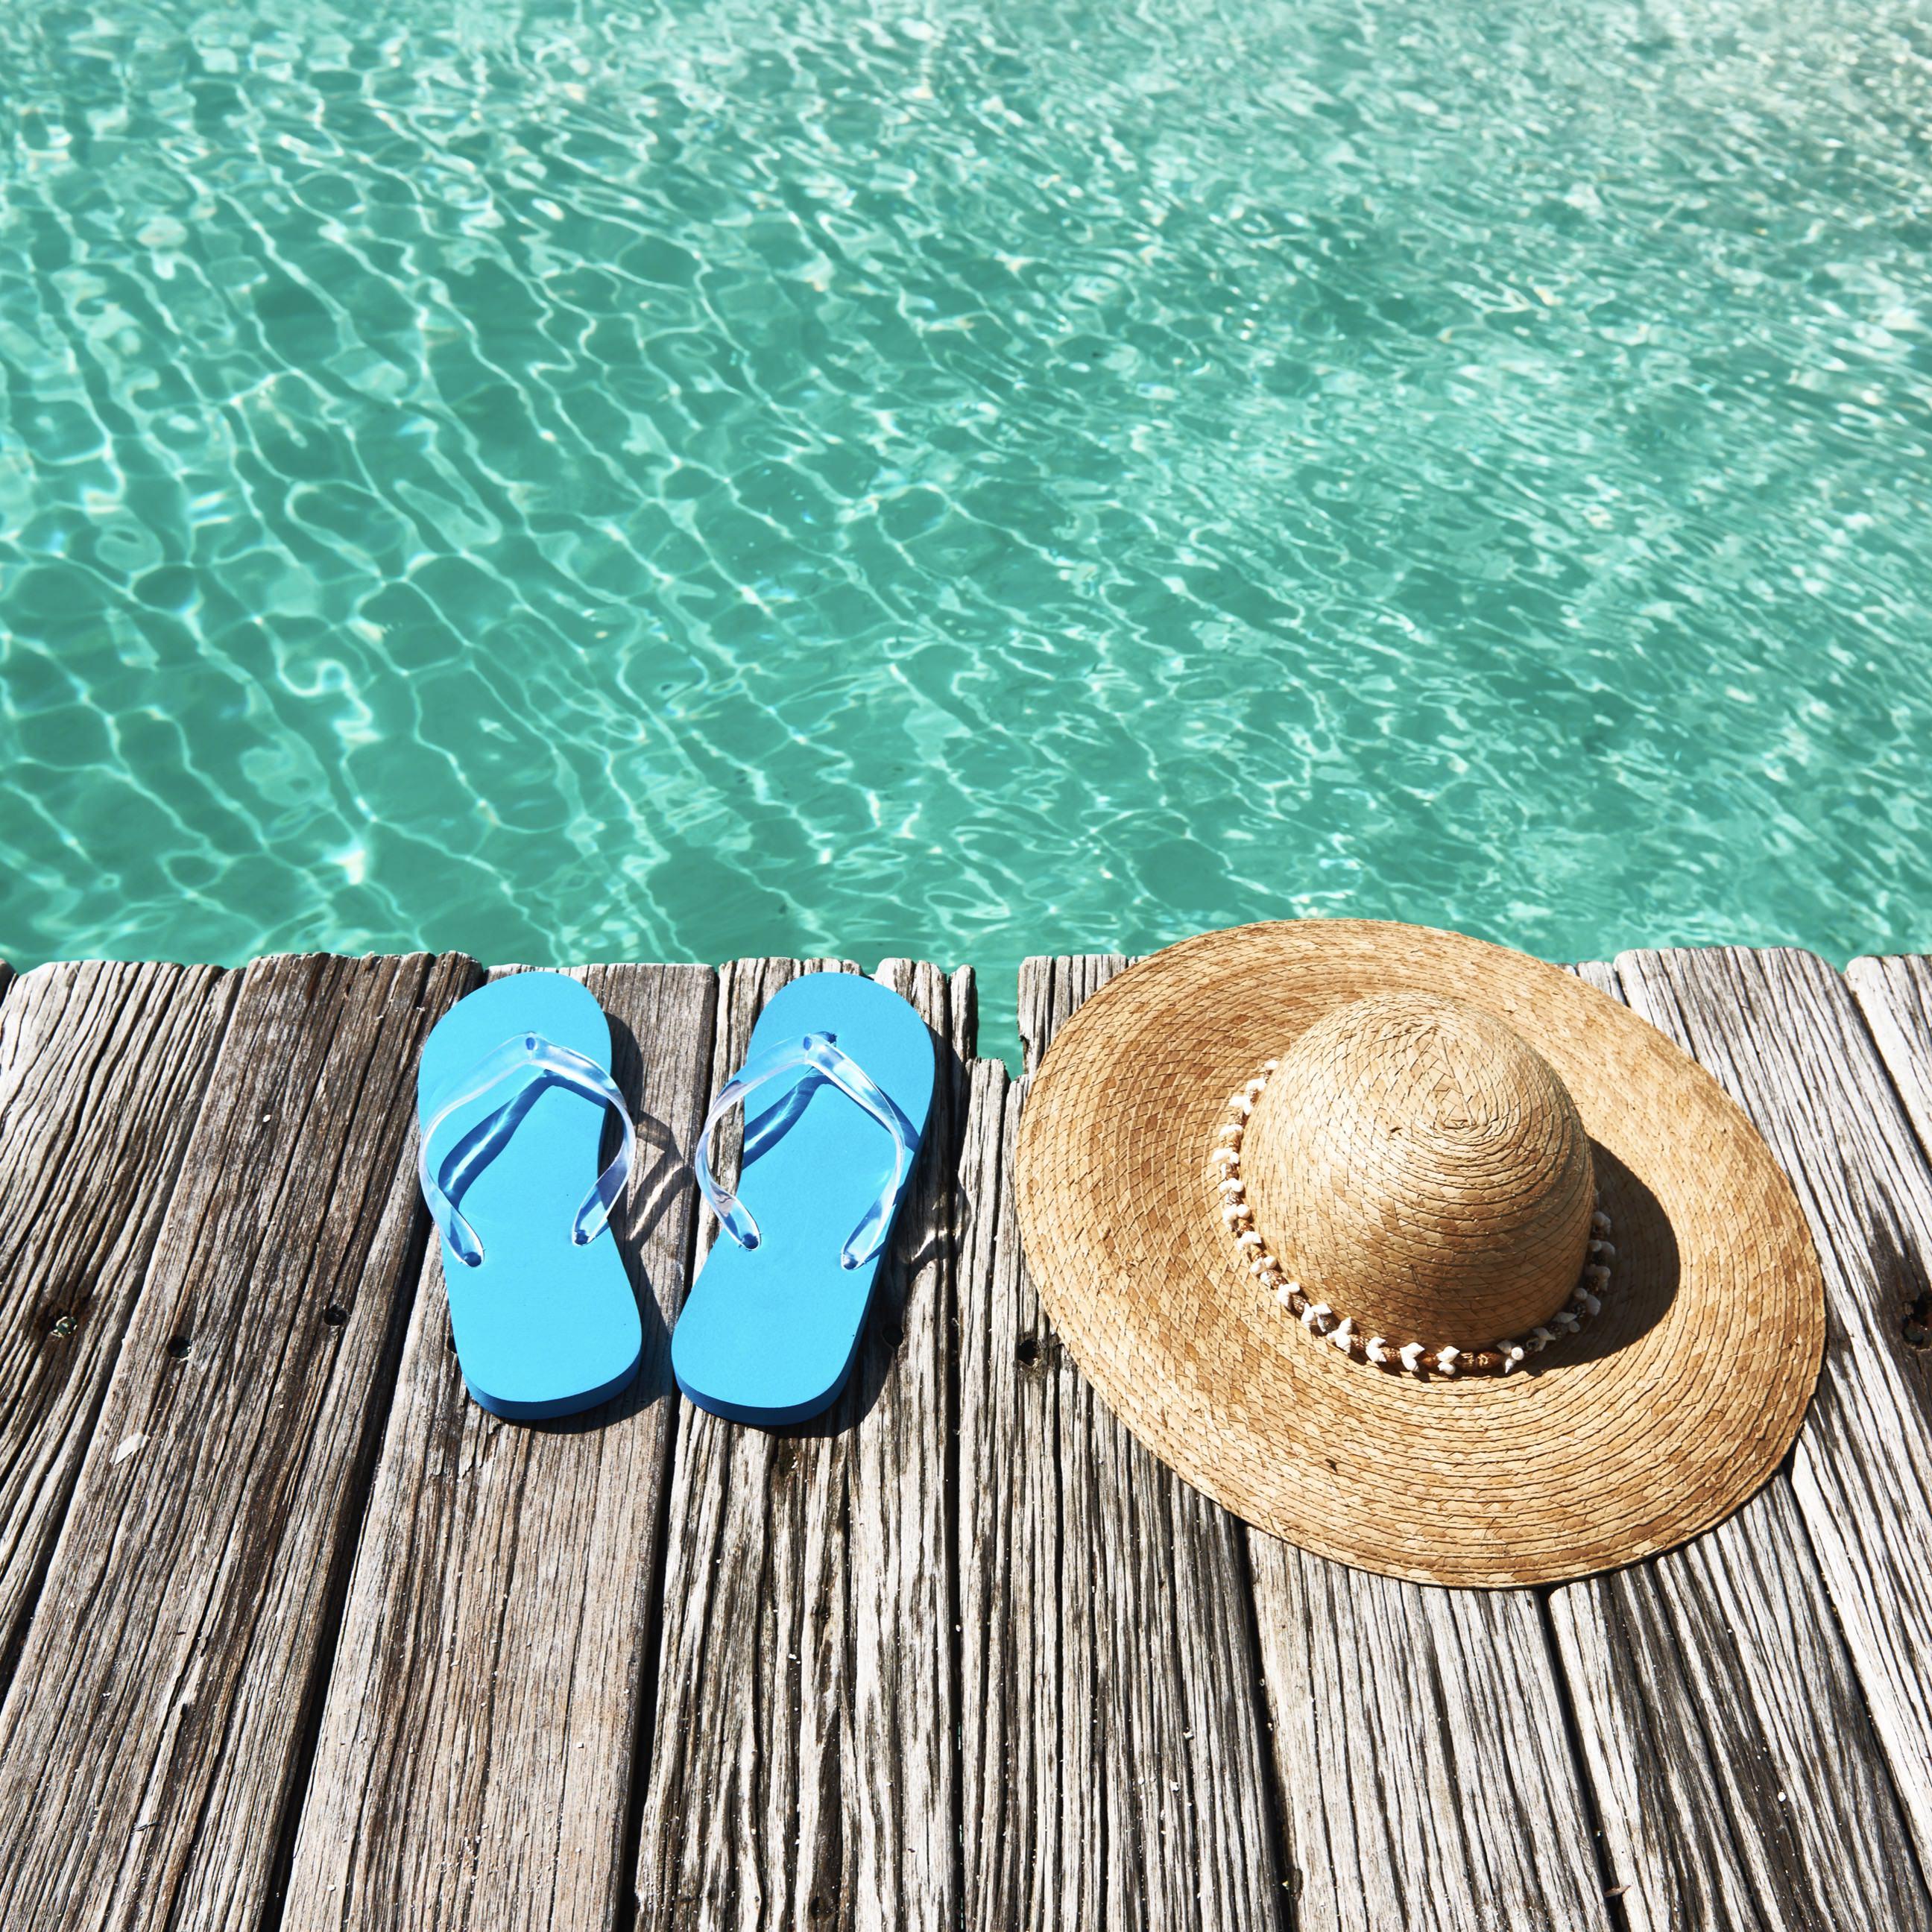 Sea Hat Sandals Beach Wallpaper Sc Ipad